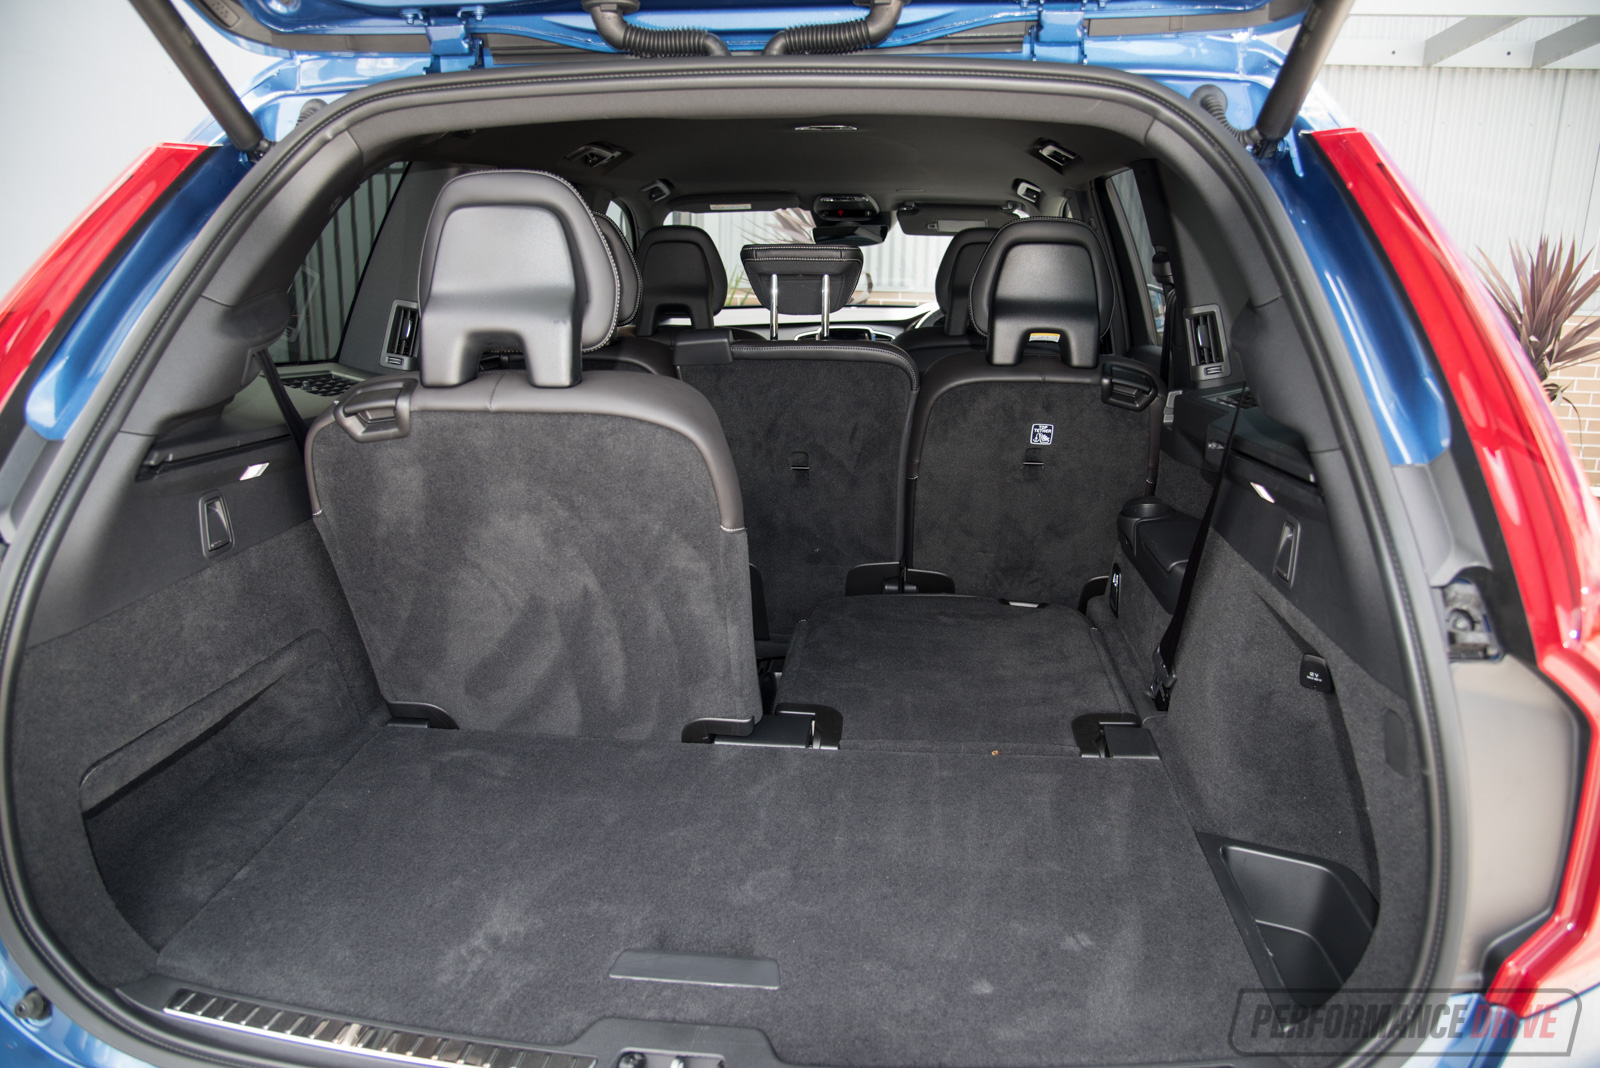 Volvo Xc90 R Design >> 2016 Volvo XC90 T6 R-Design Polestar review (video ...